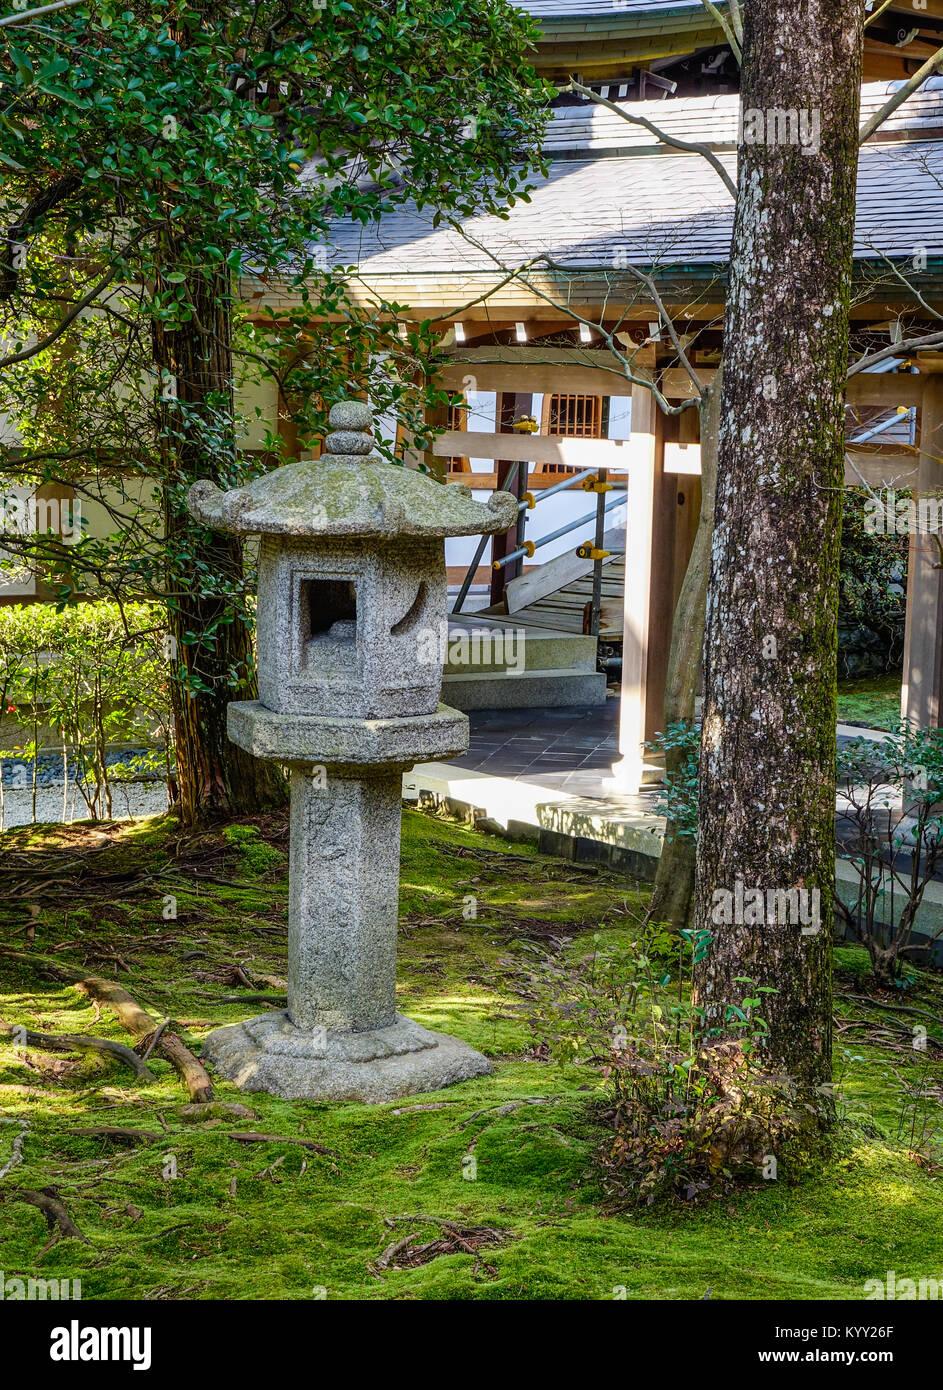 Kyoto, Japan - Dec 26, 2015. A traditional lantern at zen garden of Ryoanji Temple in Kyoto, Japan. Ryoanji Temple - Stock Image